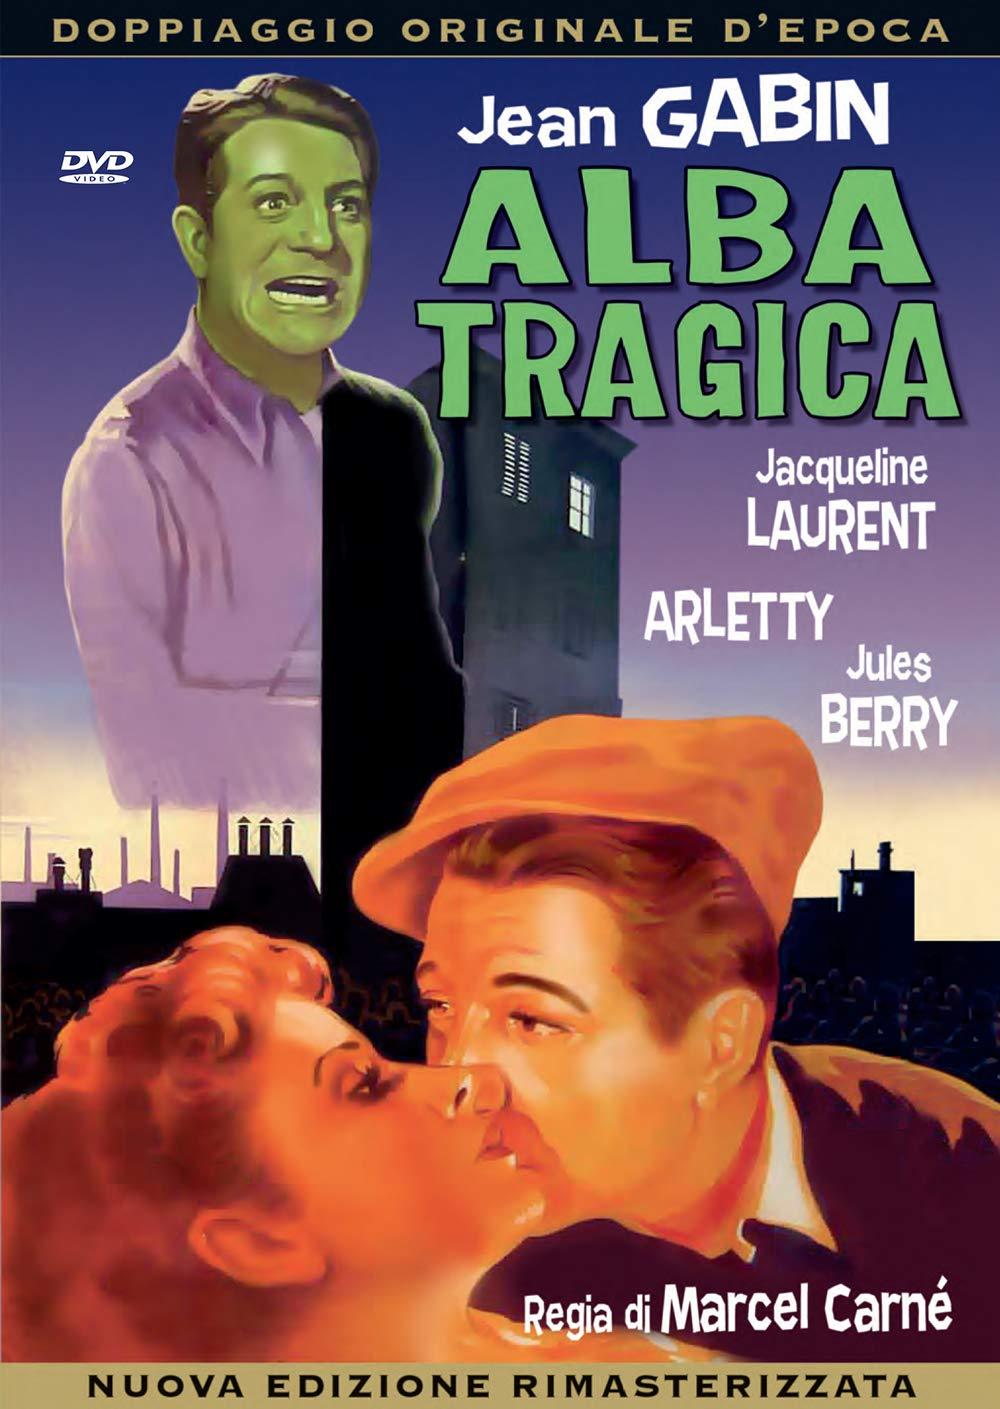 ALBA TRAGICA (DVD)